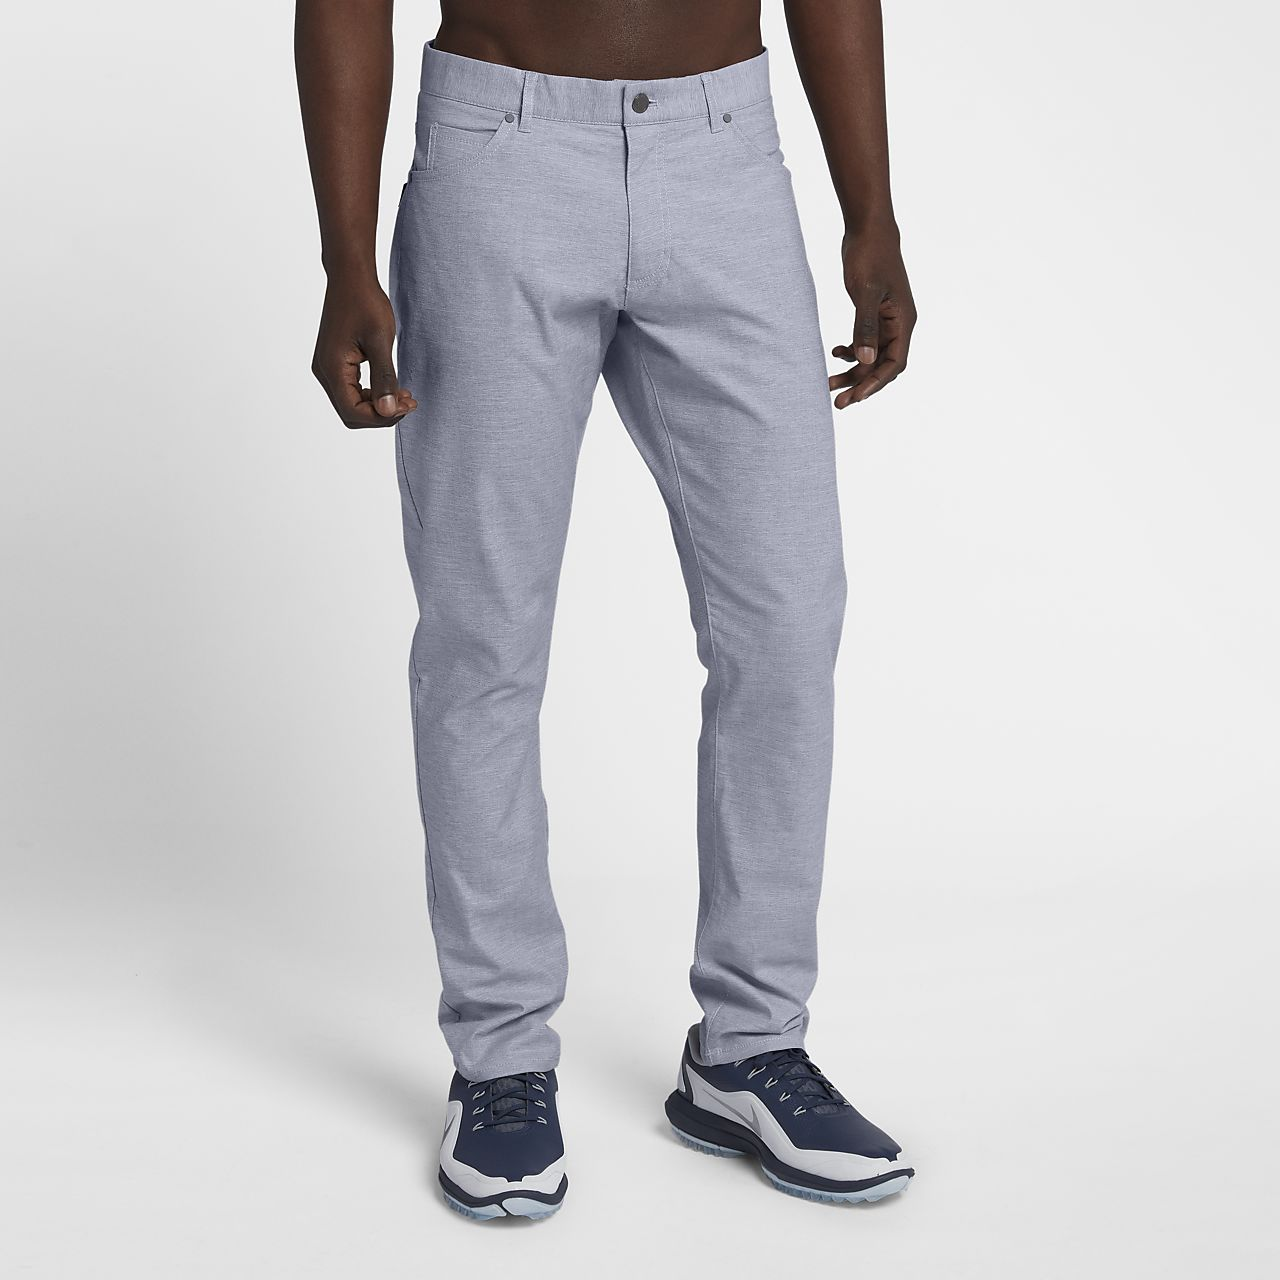 ... Nike Flex 5 Pocket Men's Slim Fit Golf Trousers